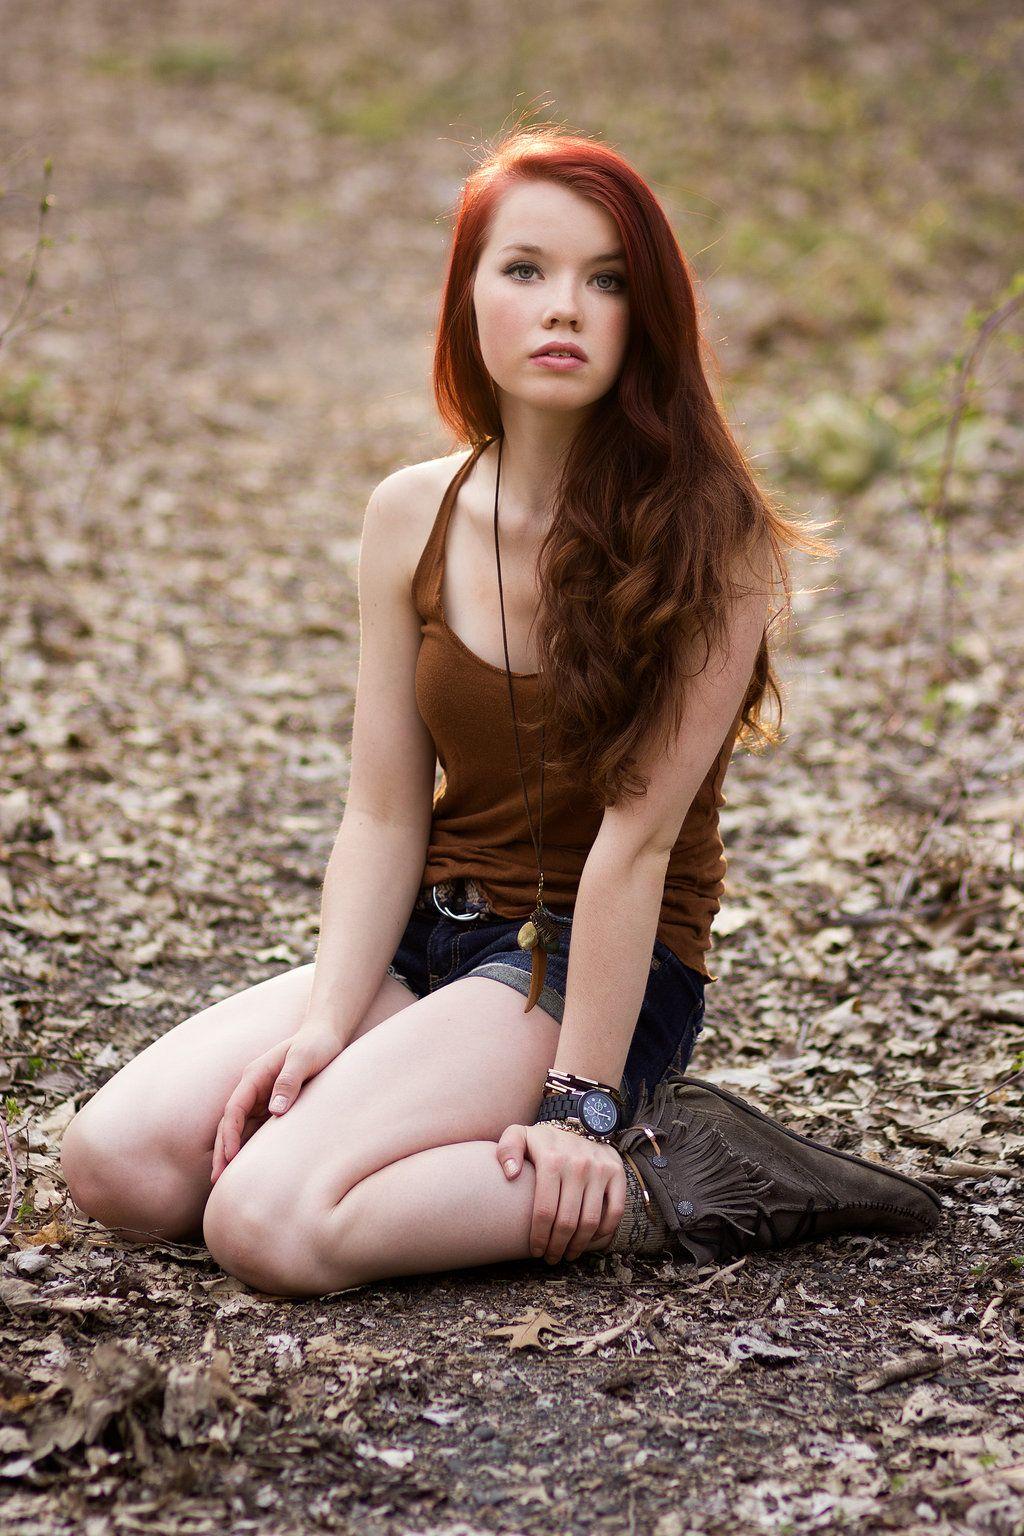 hot-teen-redhead-perfect